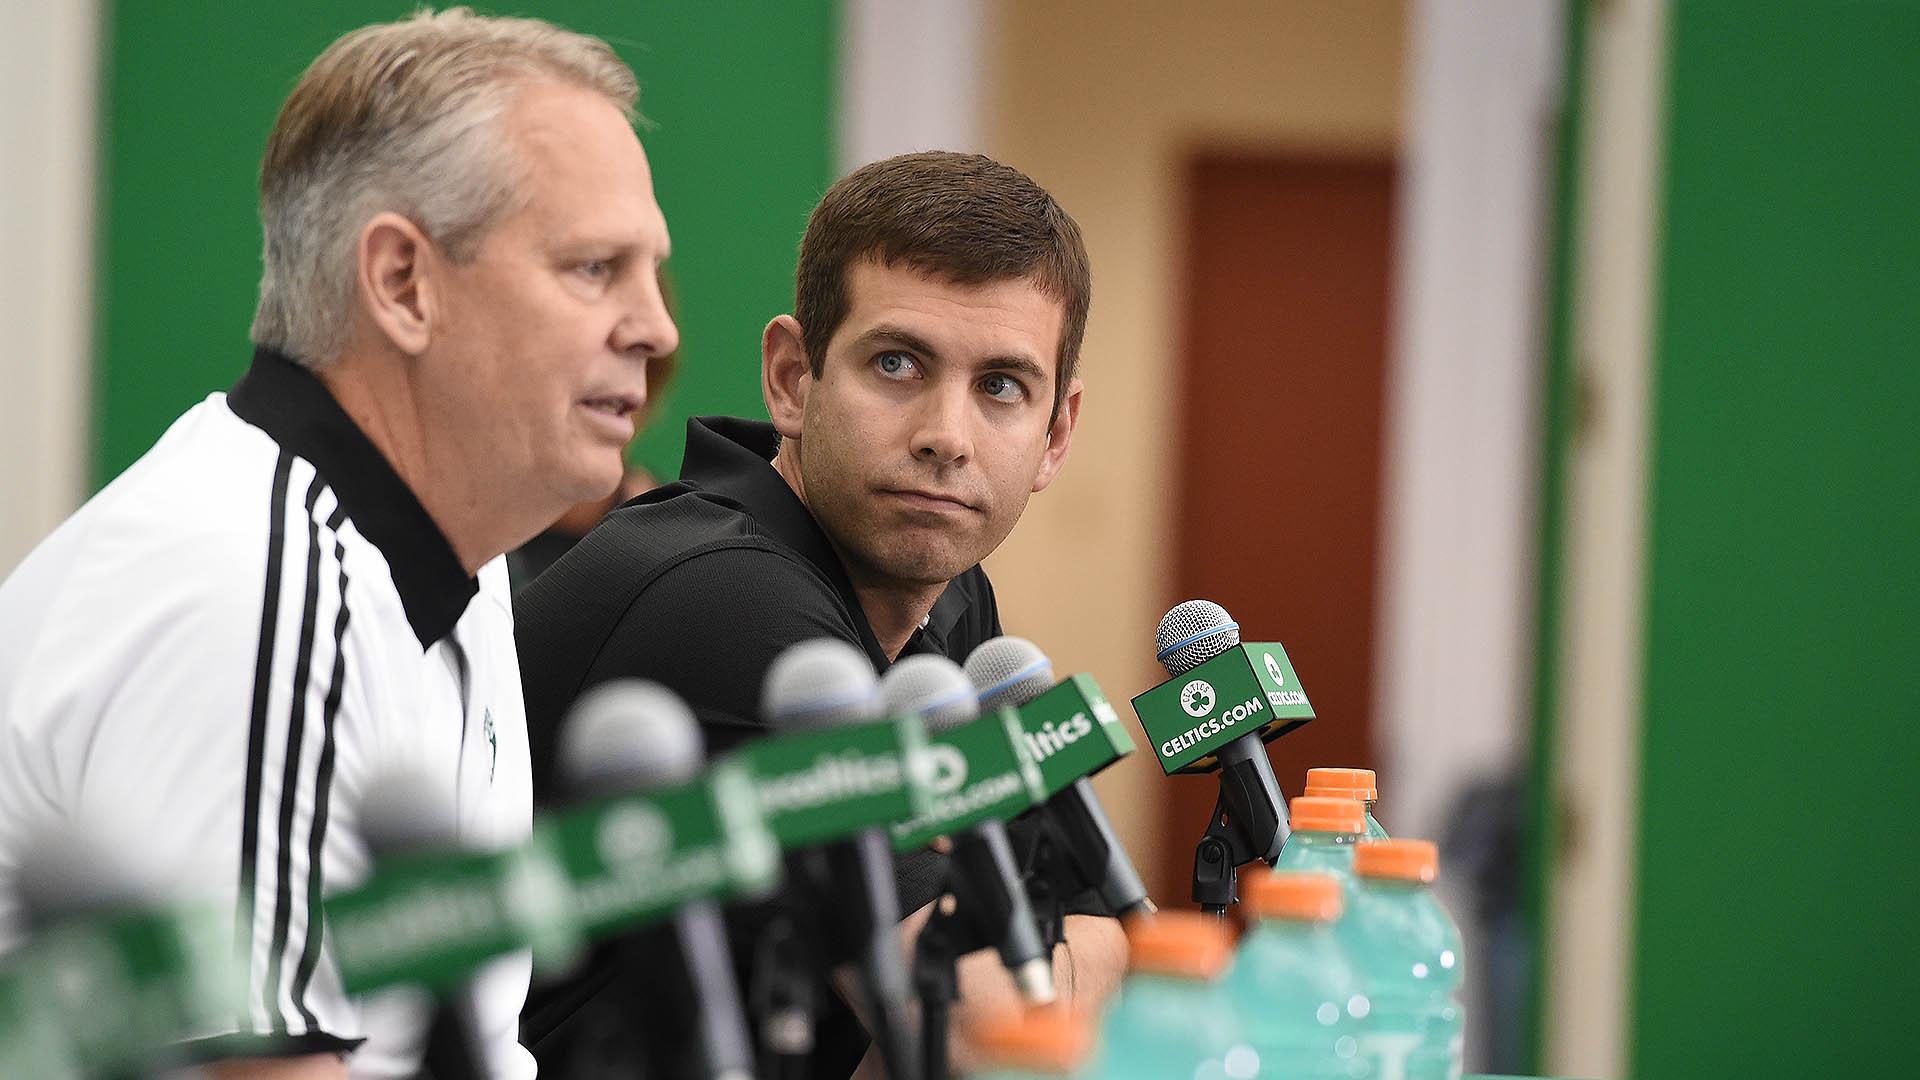 Brad Stevens adjusting to new role with Celtics, mum on new coach